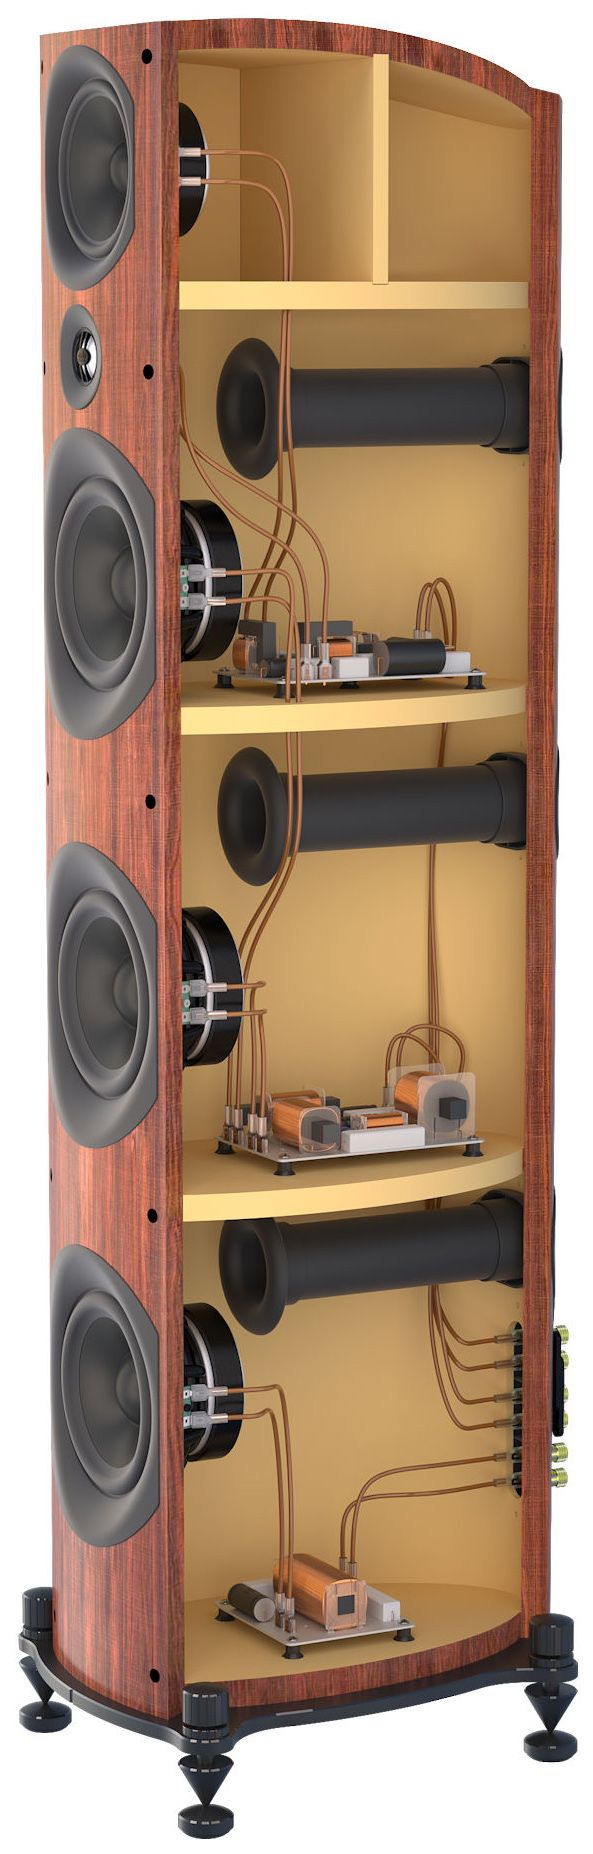 Superb PSB Imagine T3 Floor Standing Speakers Review   HomeTheaterHifi.com. Speaker  DesignSpeakers